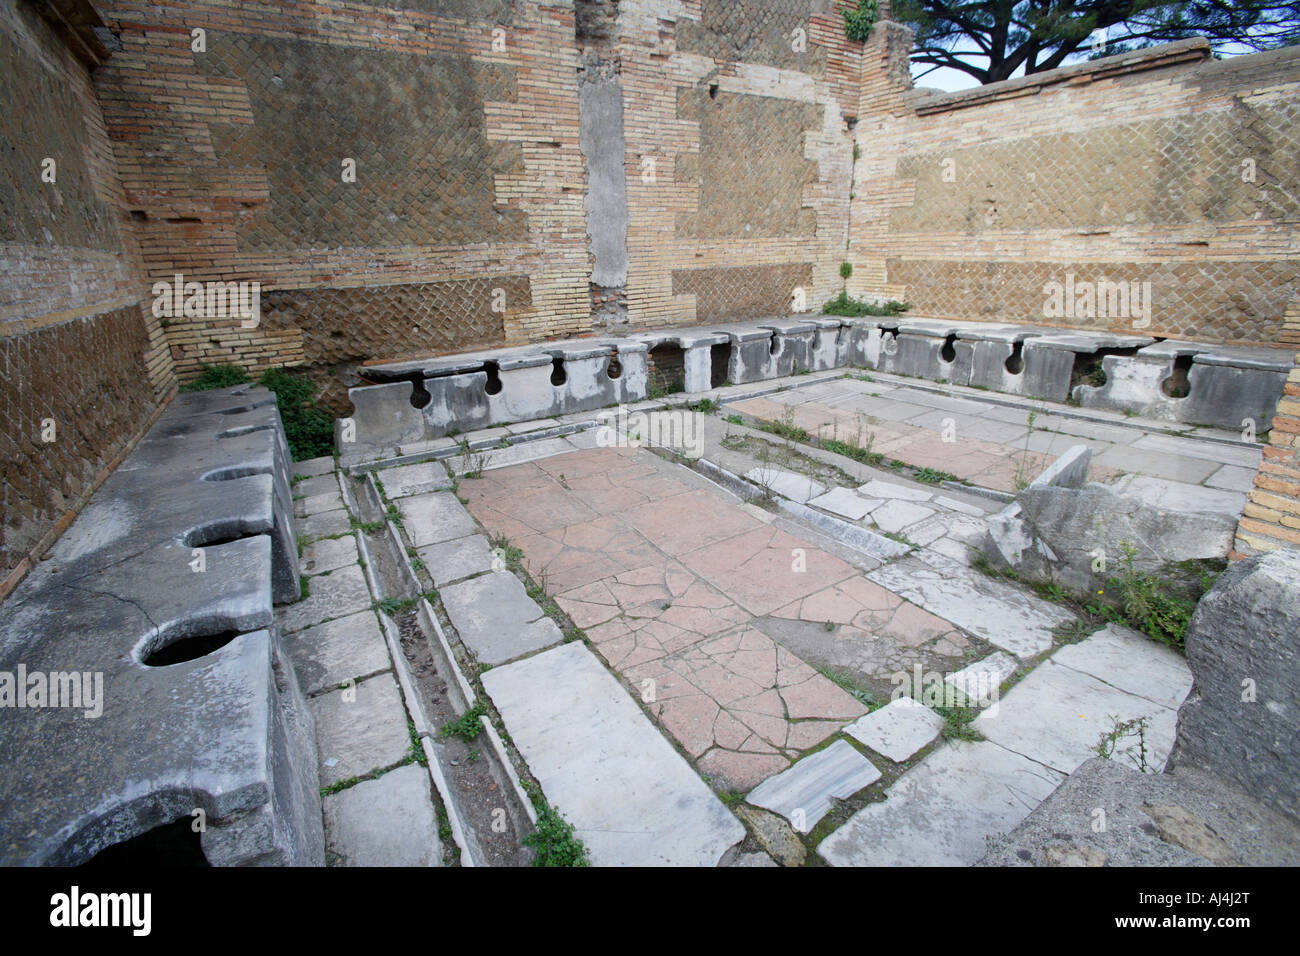 Public Latrines In The Ancient Roman Port Of Ostia Antica, Italy - Stock Image